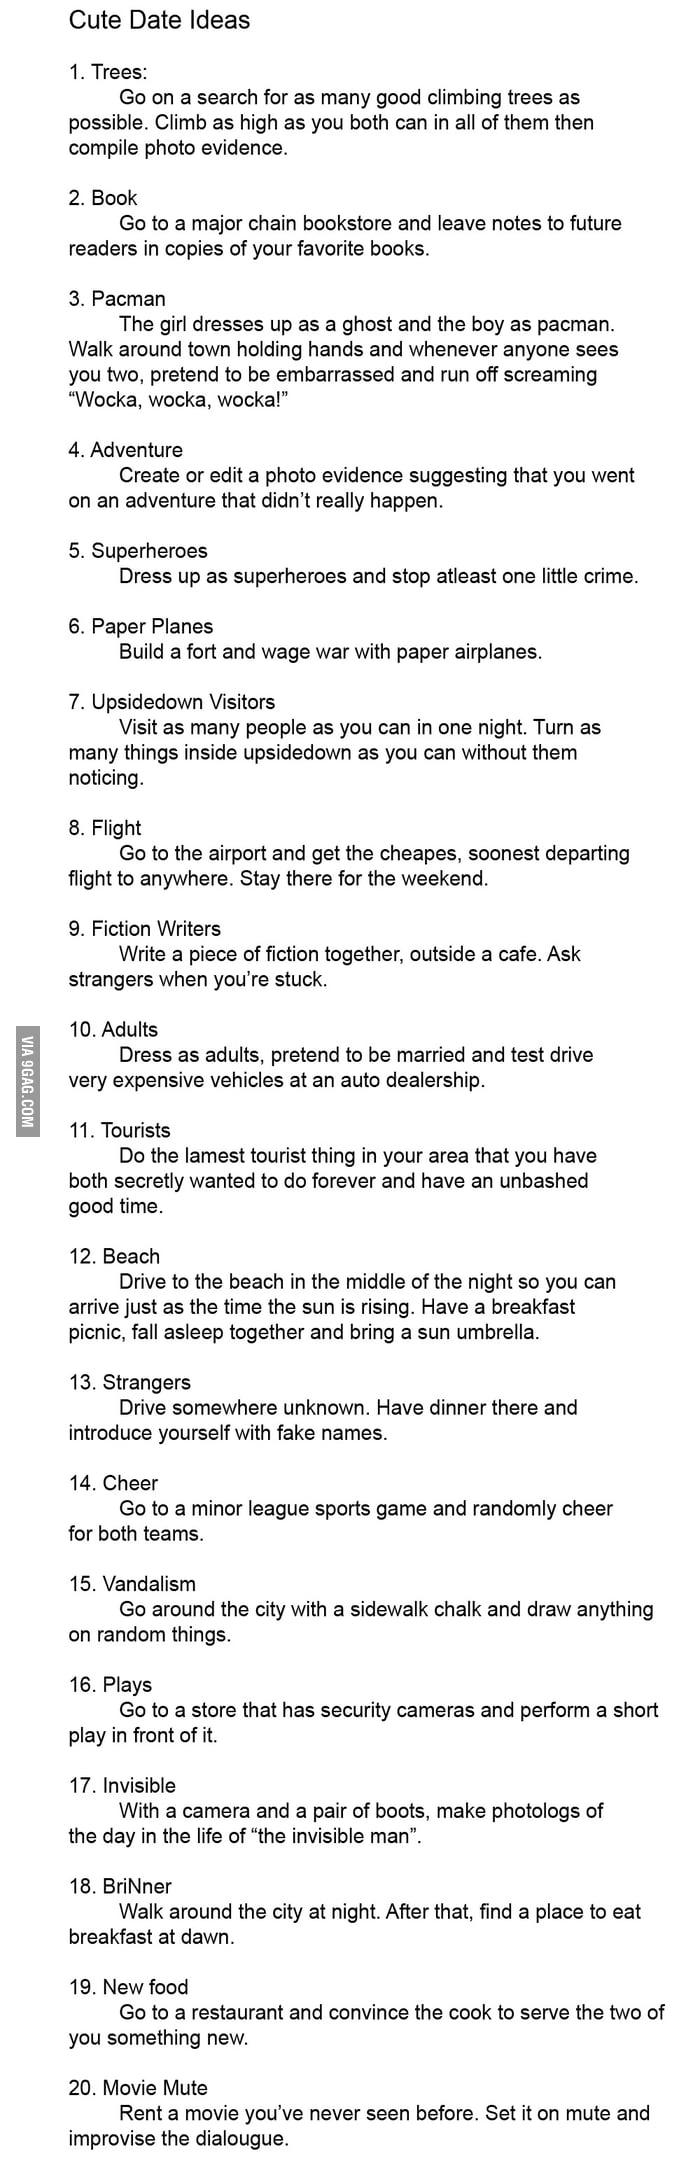 9gag dating ideas